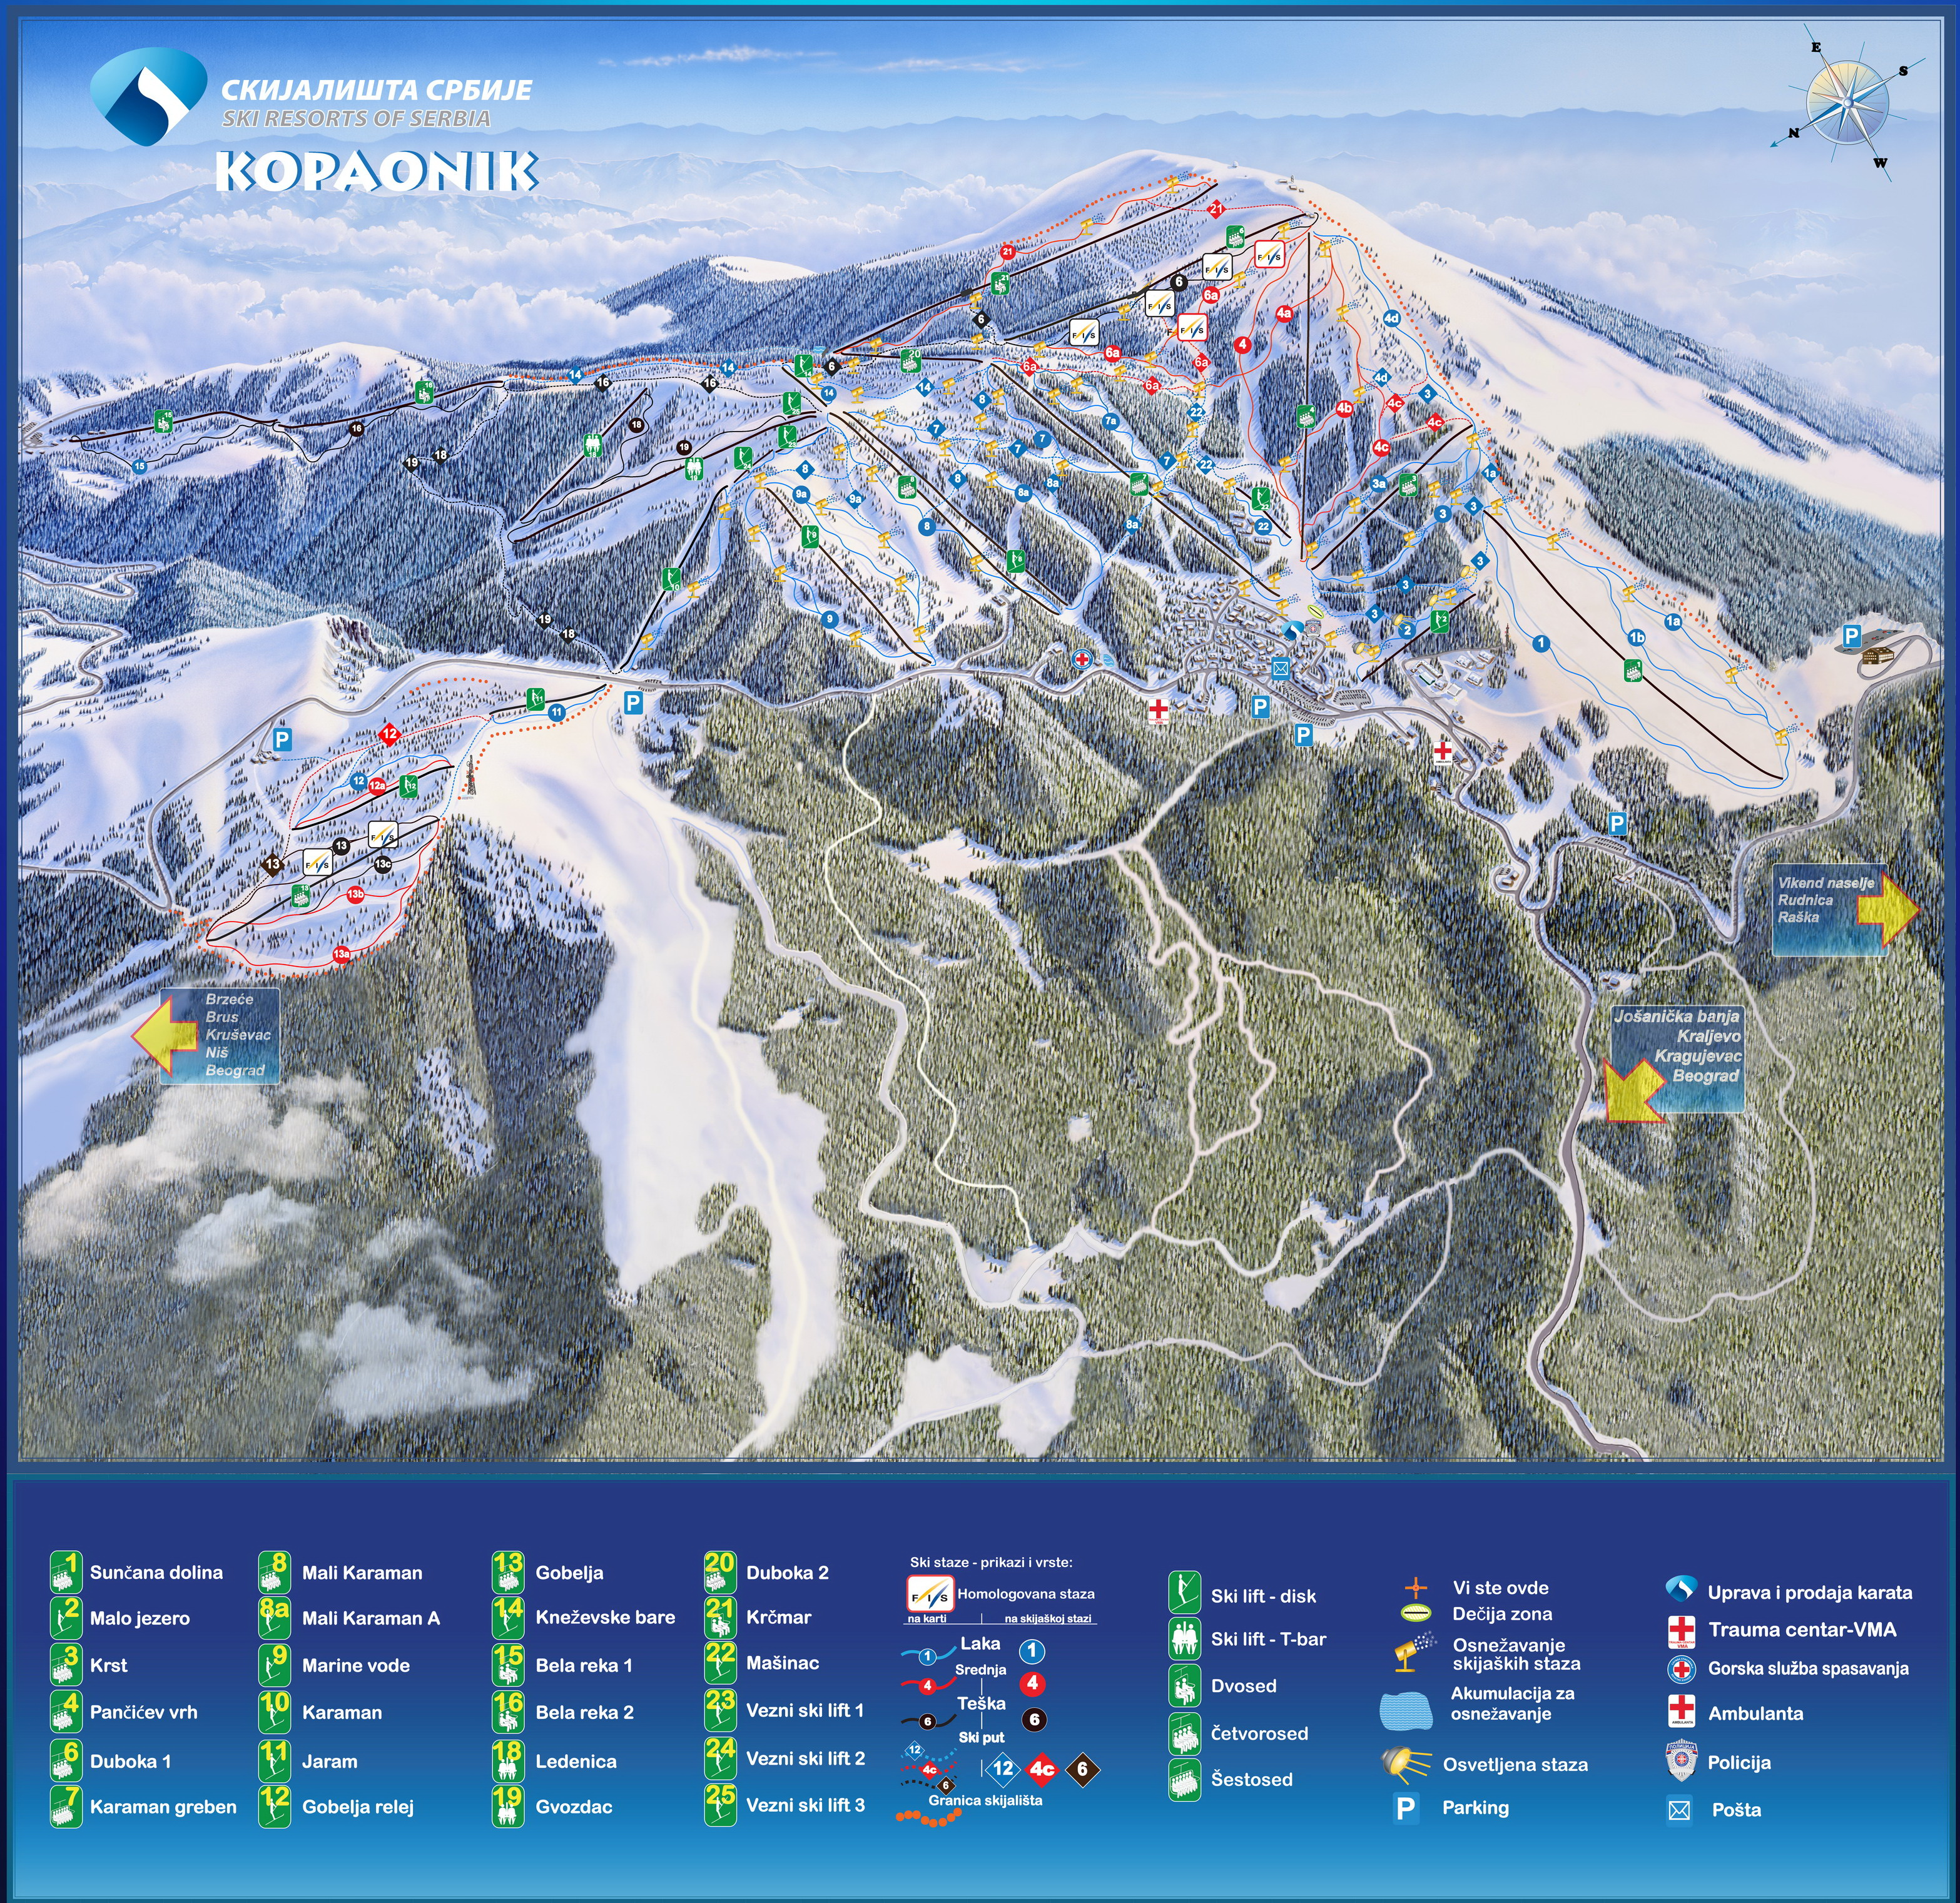 kopaonik mapa Kopaonik ski resort | RISK AND SAFETY ENGINEERING kopaonik mapa